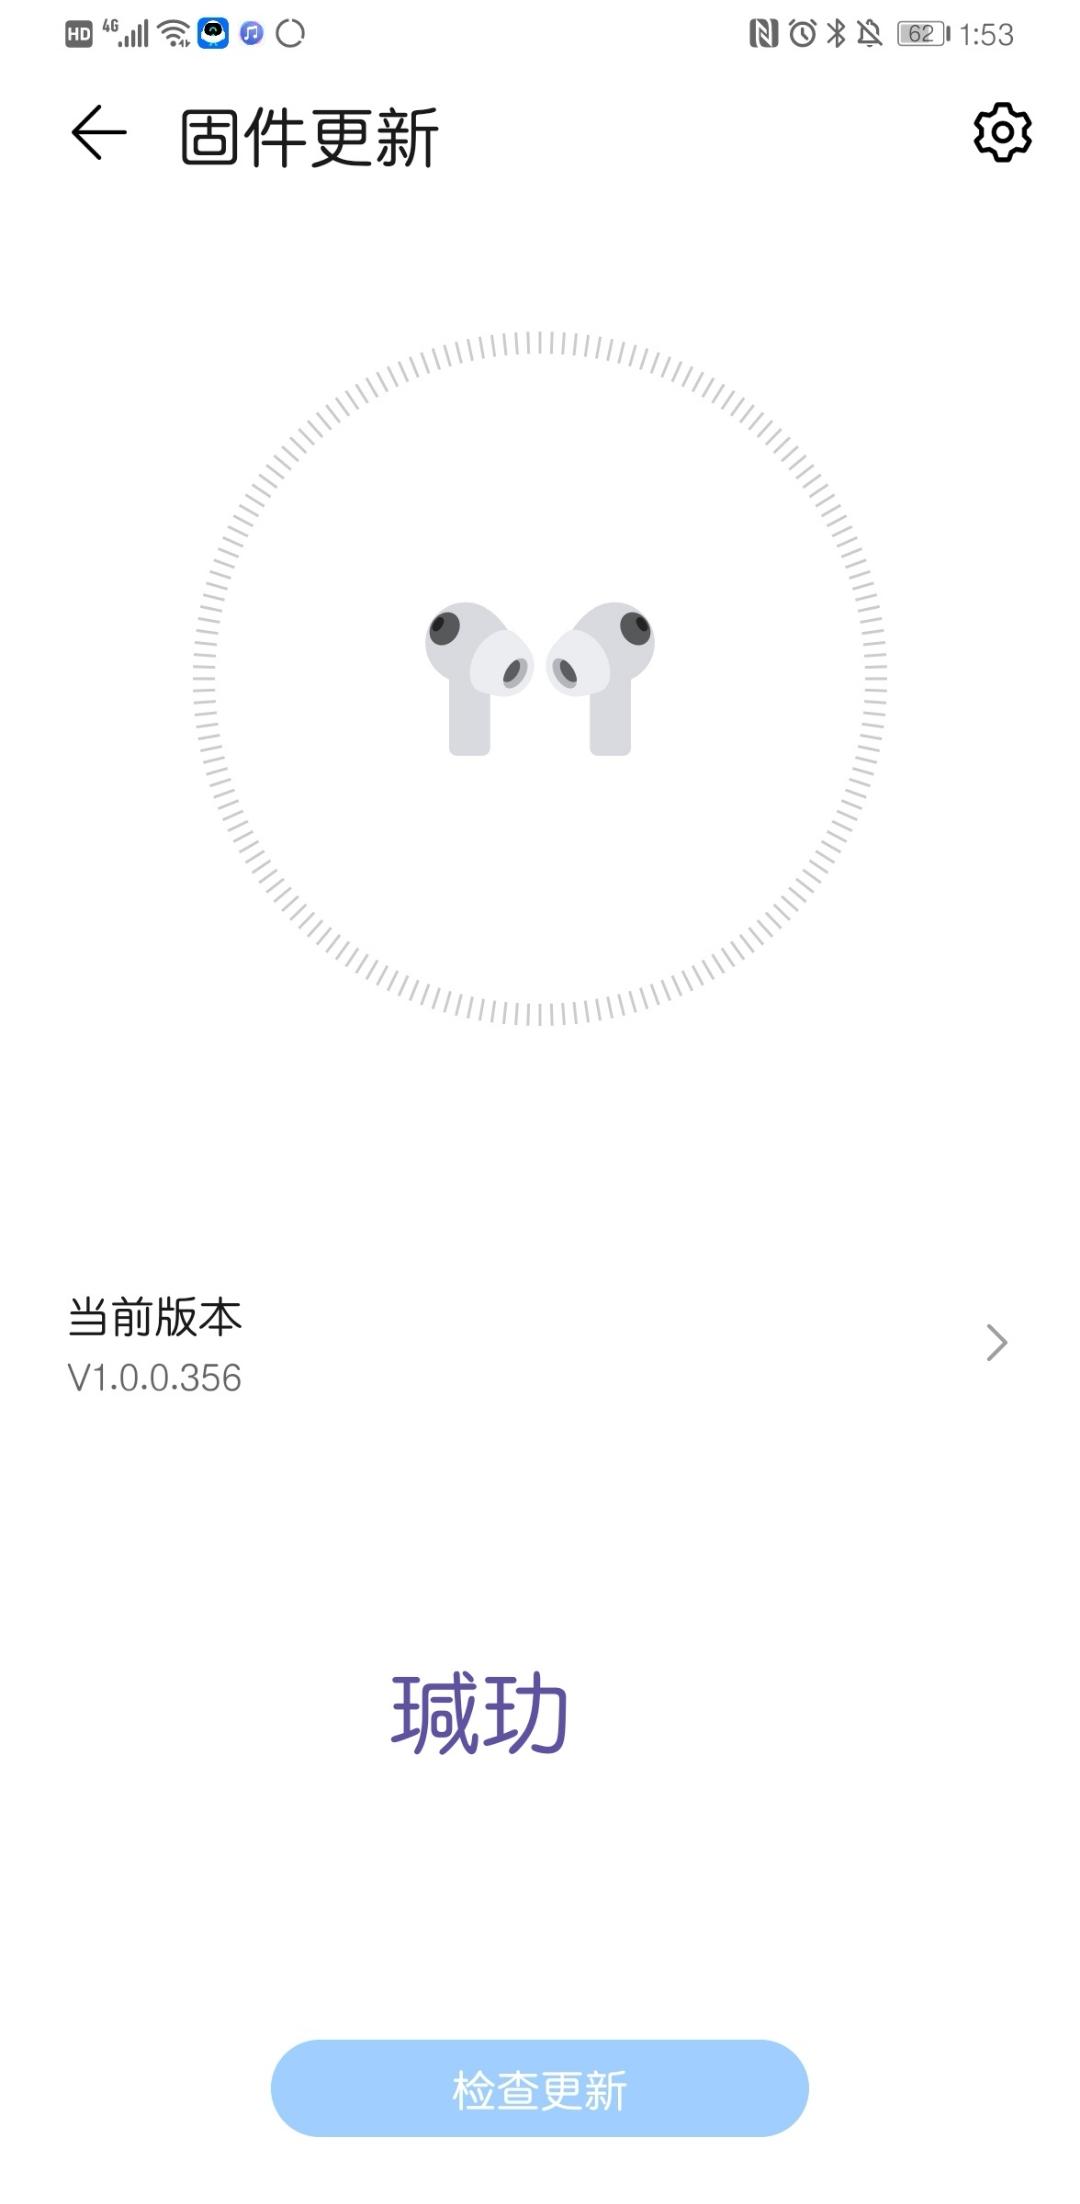 Screenshot_20210329_135307_com.huawei.smarthome_edit_262601286766179.jpg